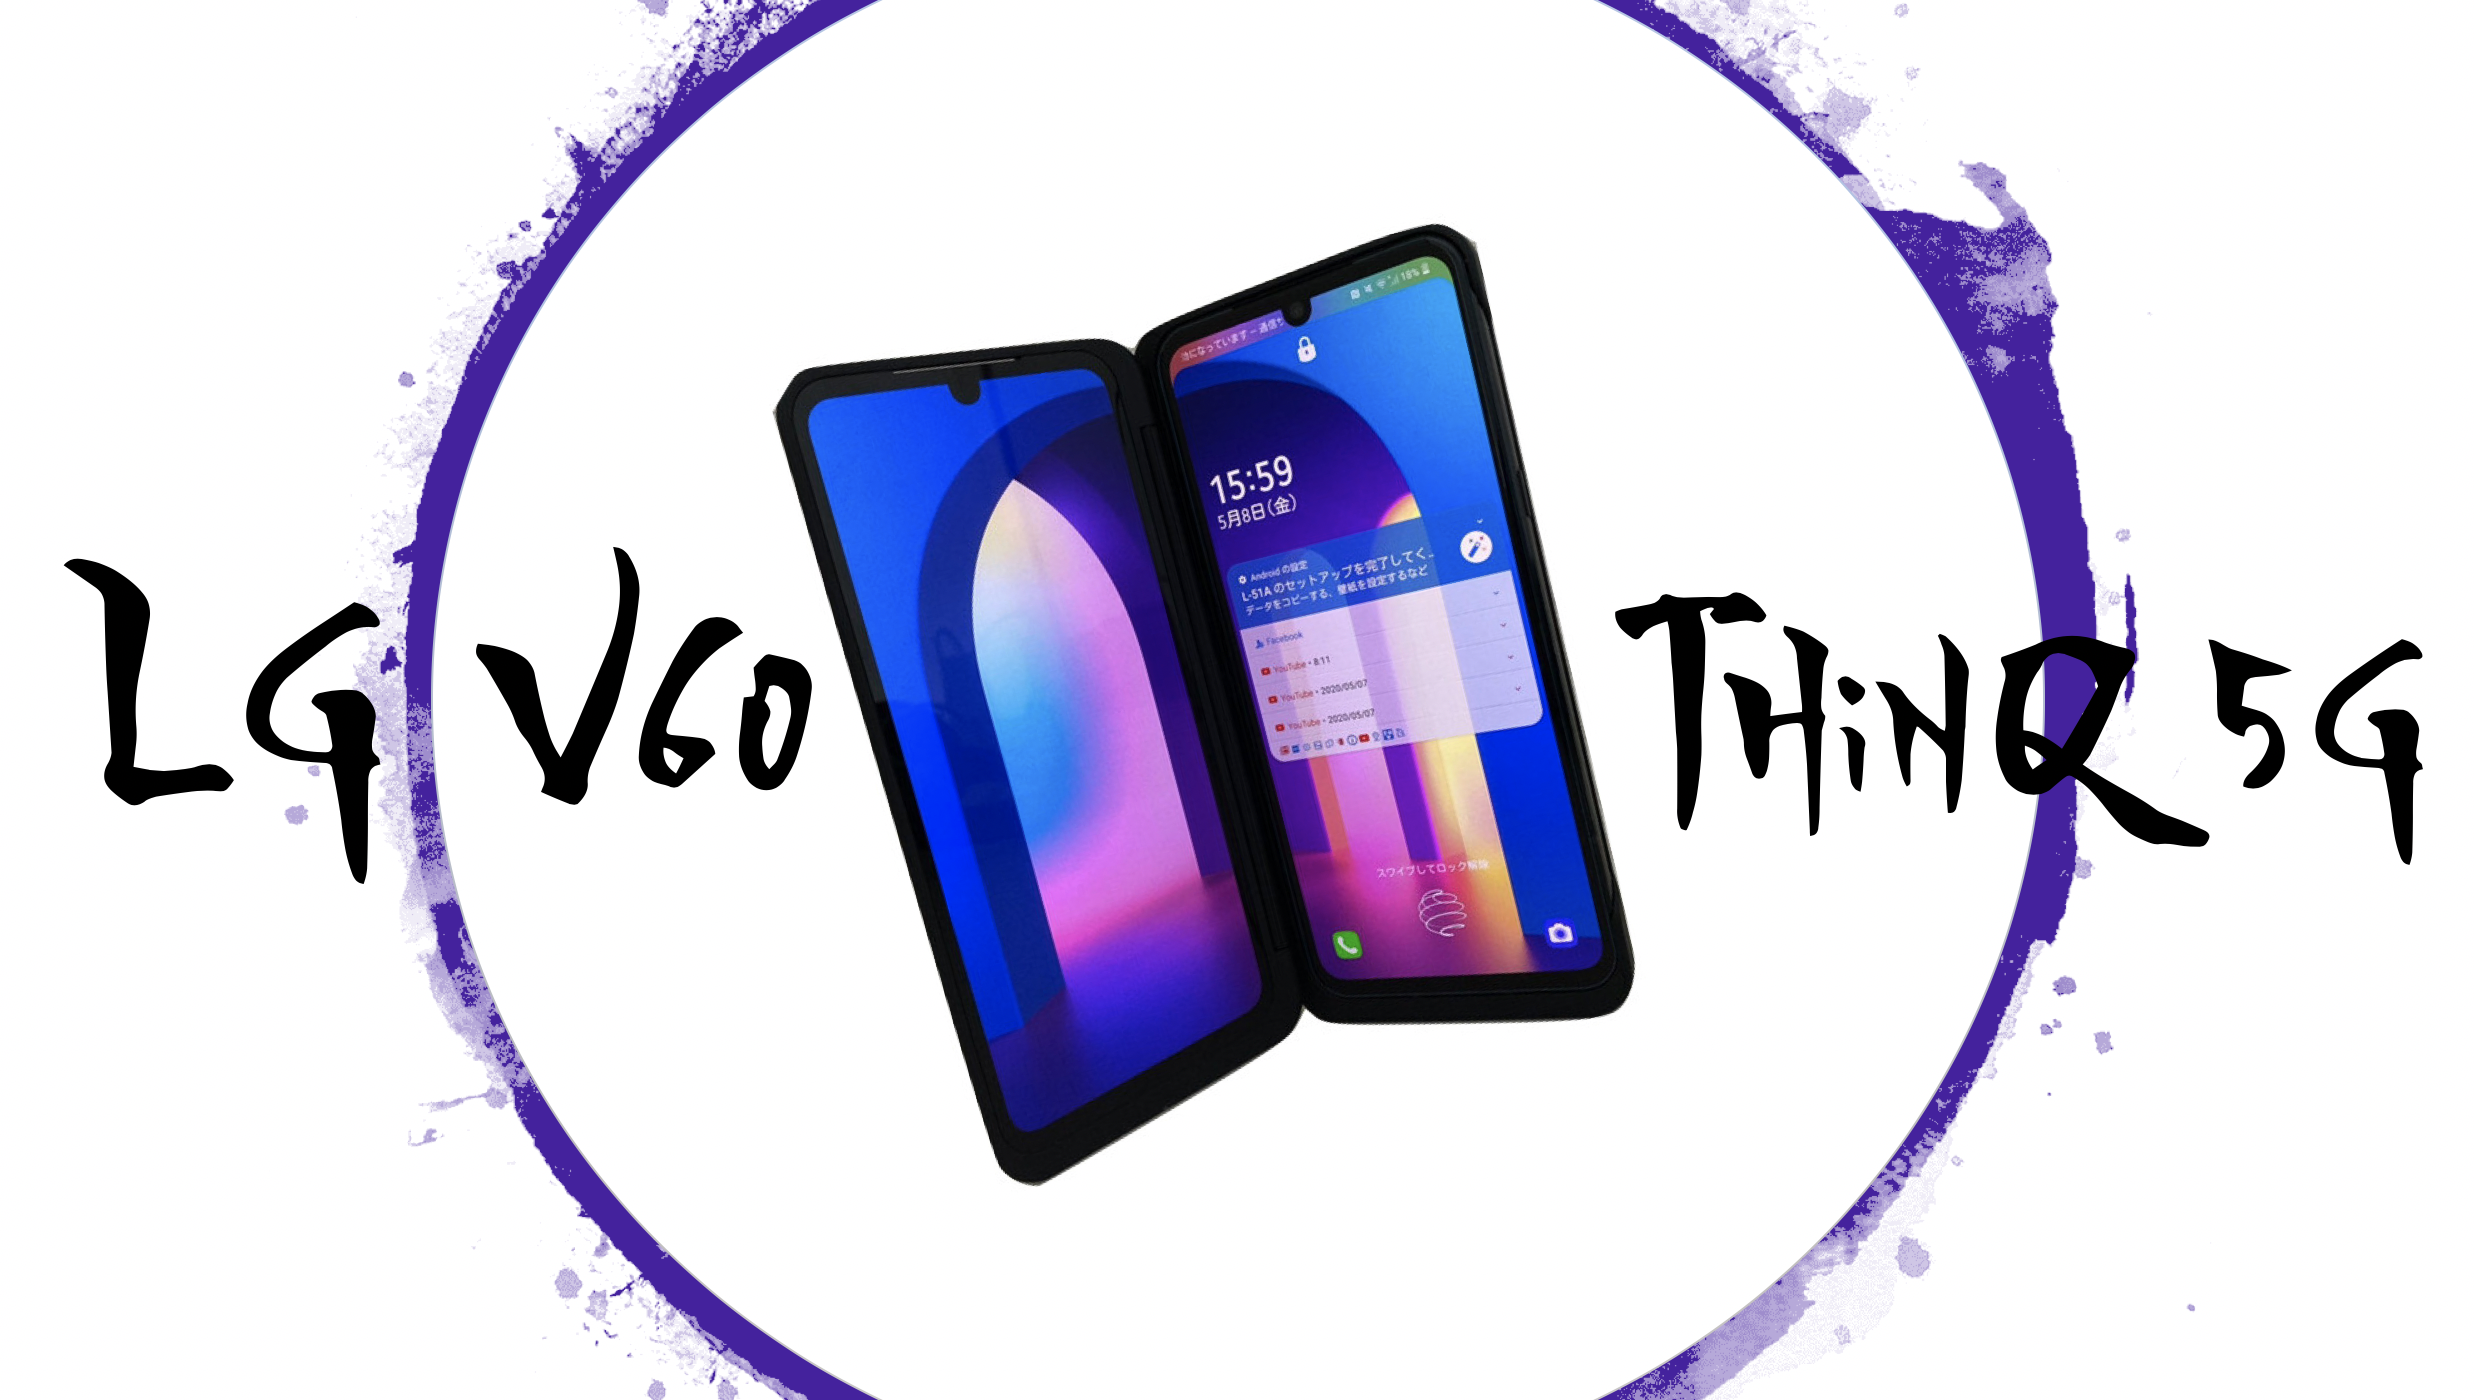 LG V60 ThinQ 5G実機レビュー【動画有】 価格・スペックを解説!2画面スマホのメリットとは?